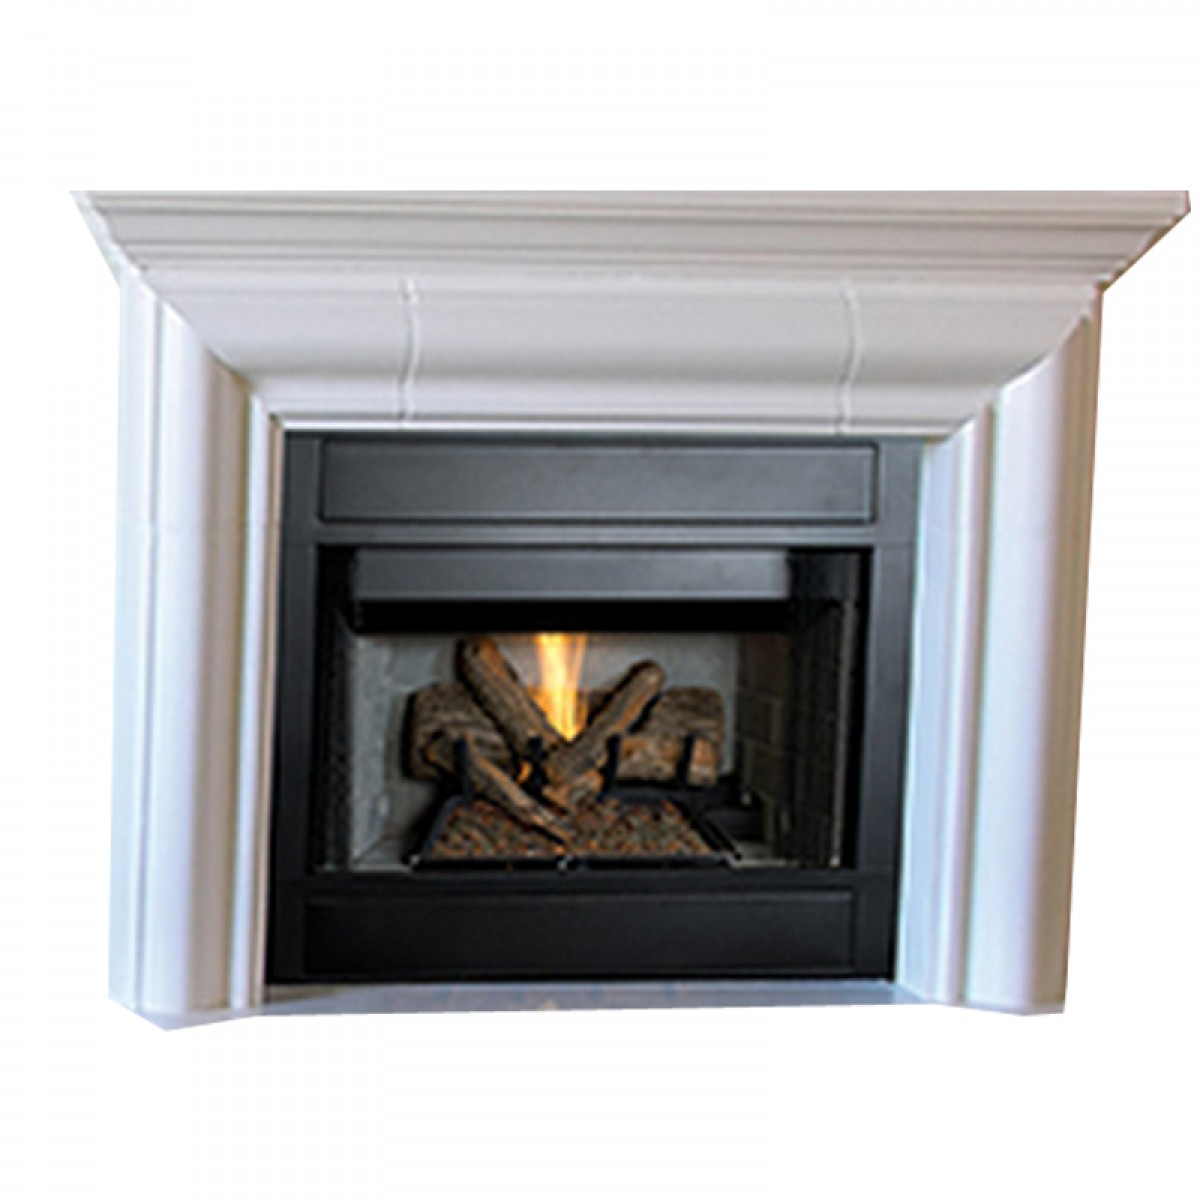 Ihp Superior Brt2032tmn 32 Ng Mv Fireplace Wht Brck Hr